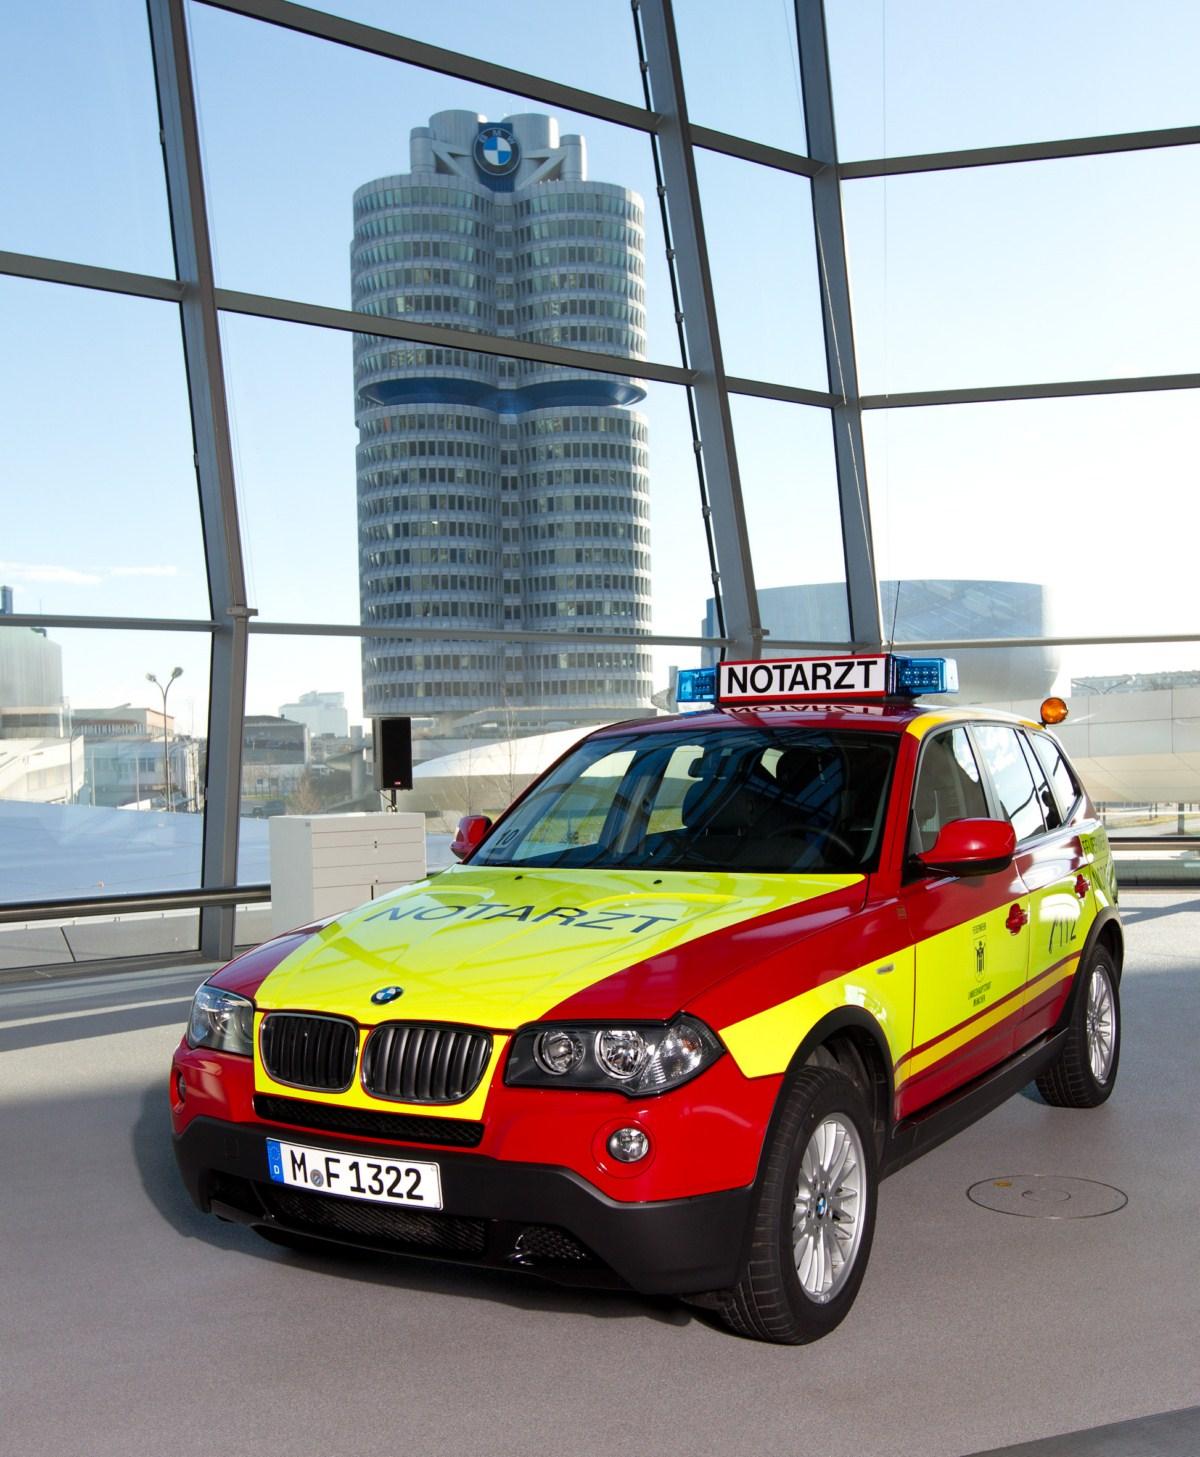 BMW X3 E83 Notarzt Muenchen 03